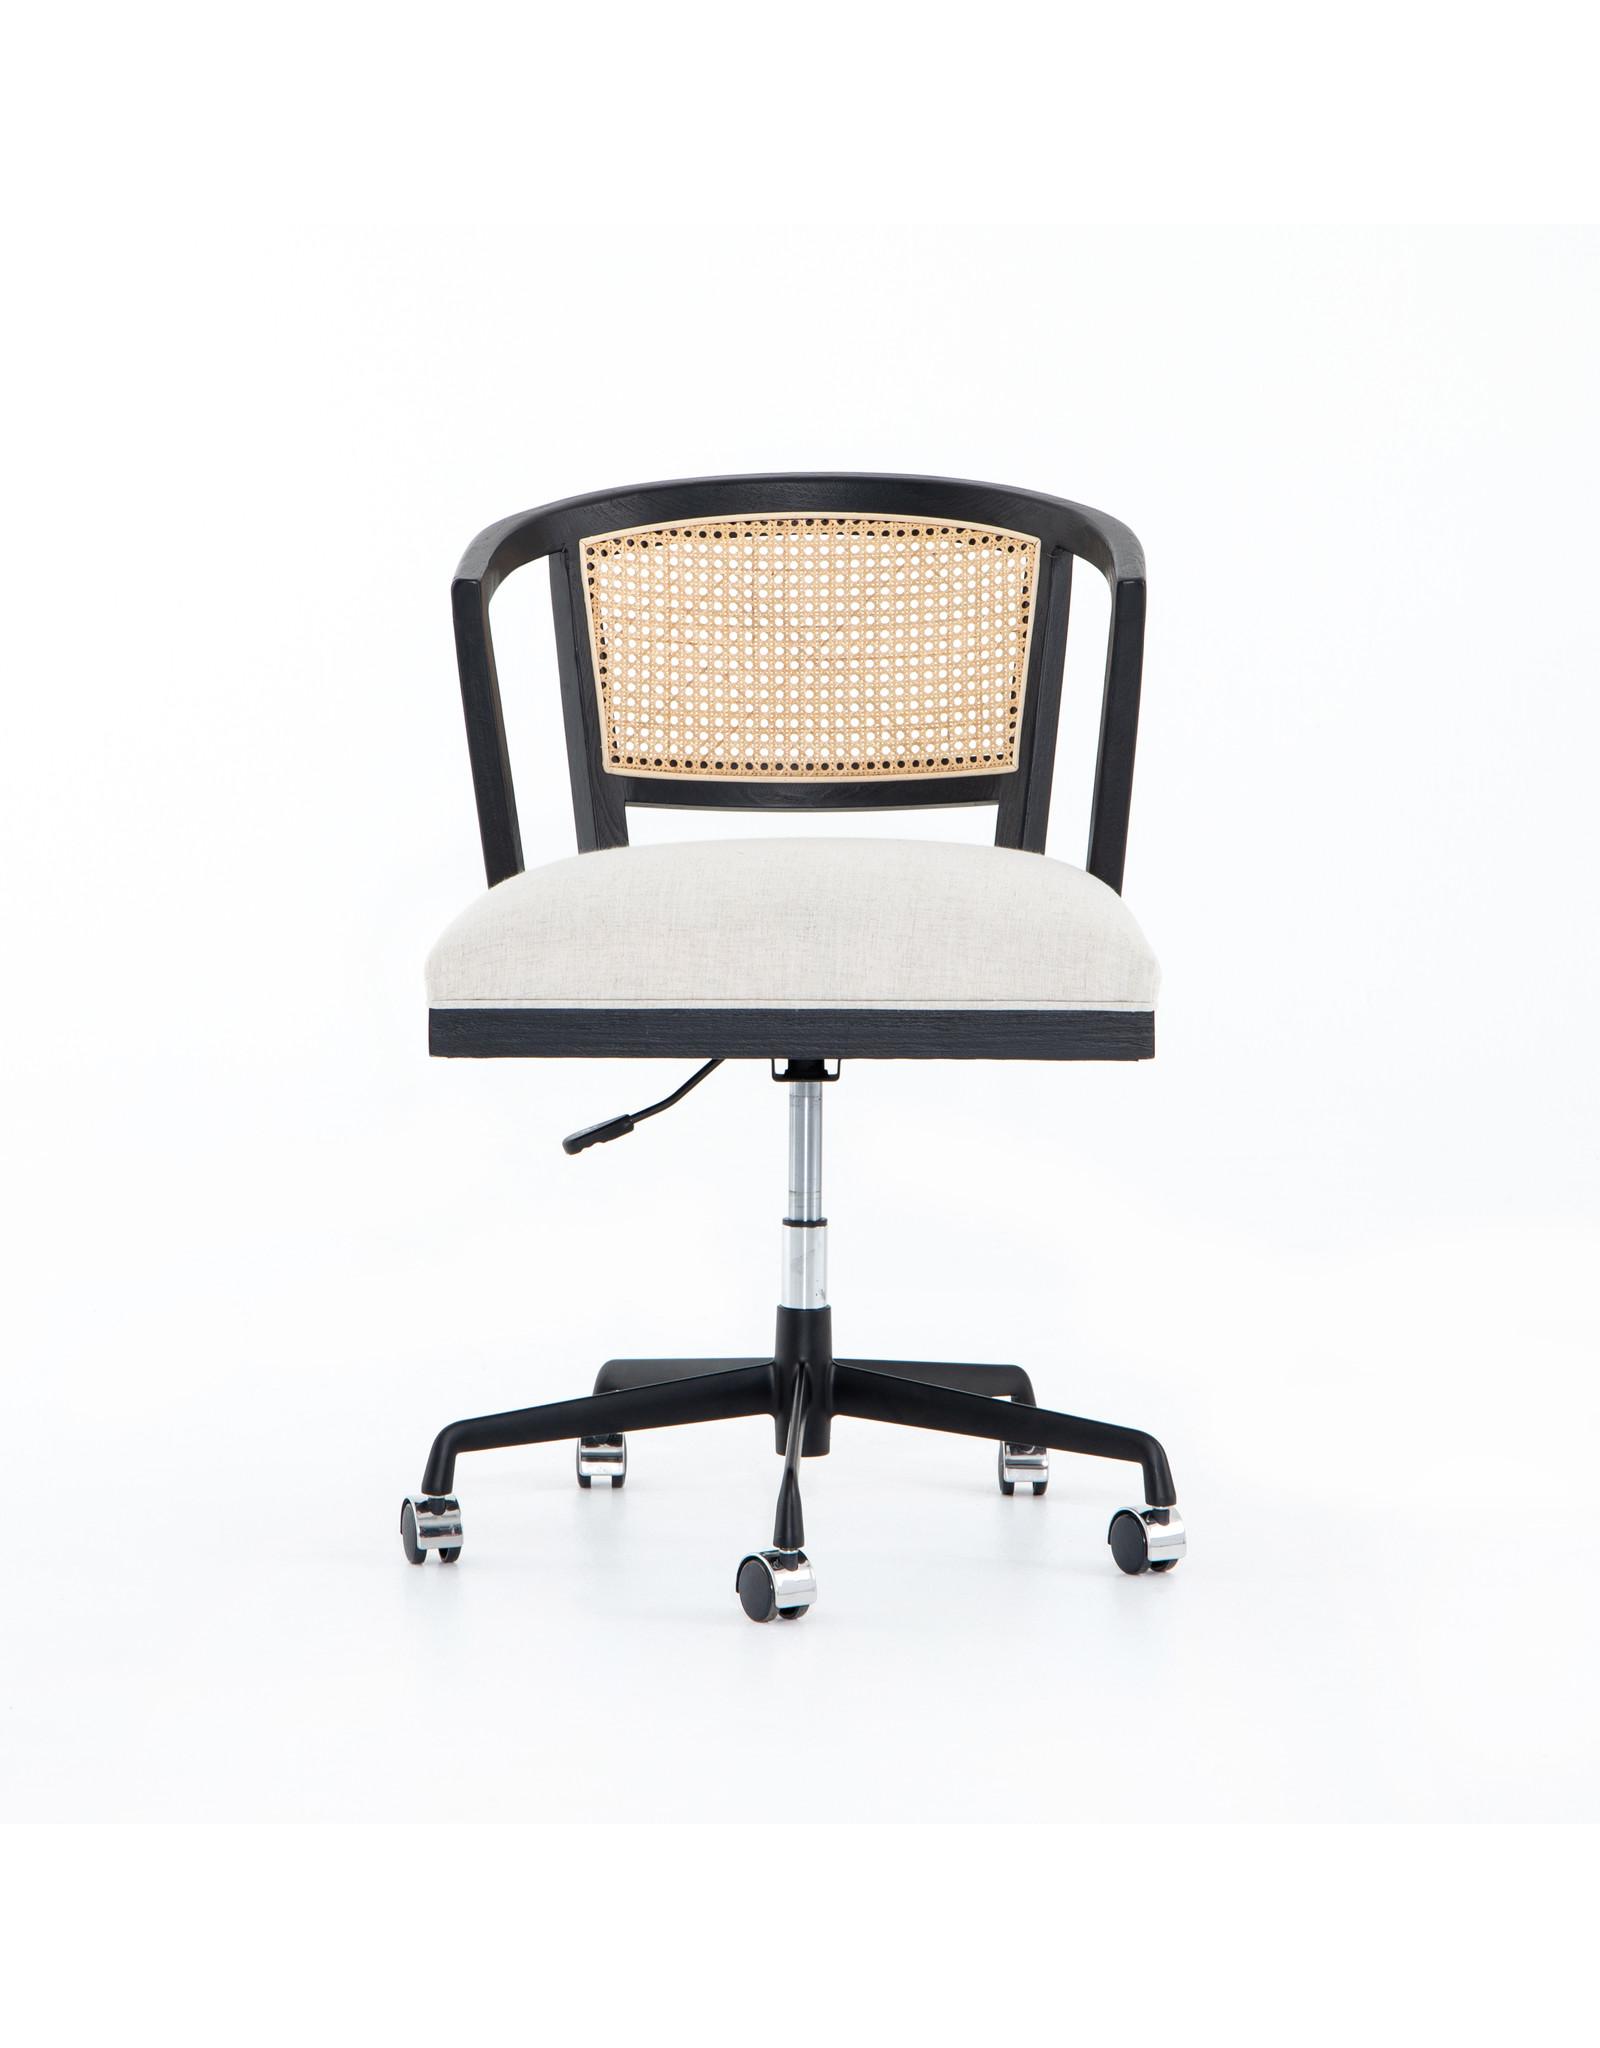 *Alexa Desk Chair